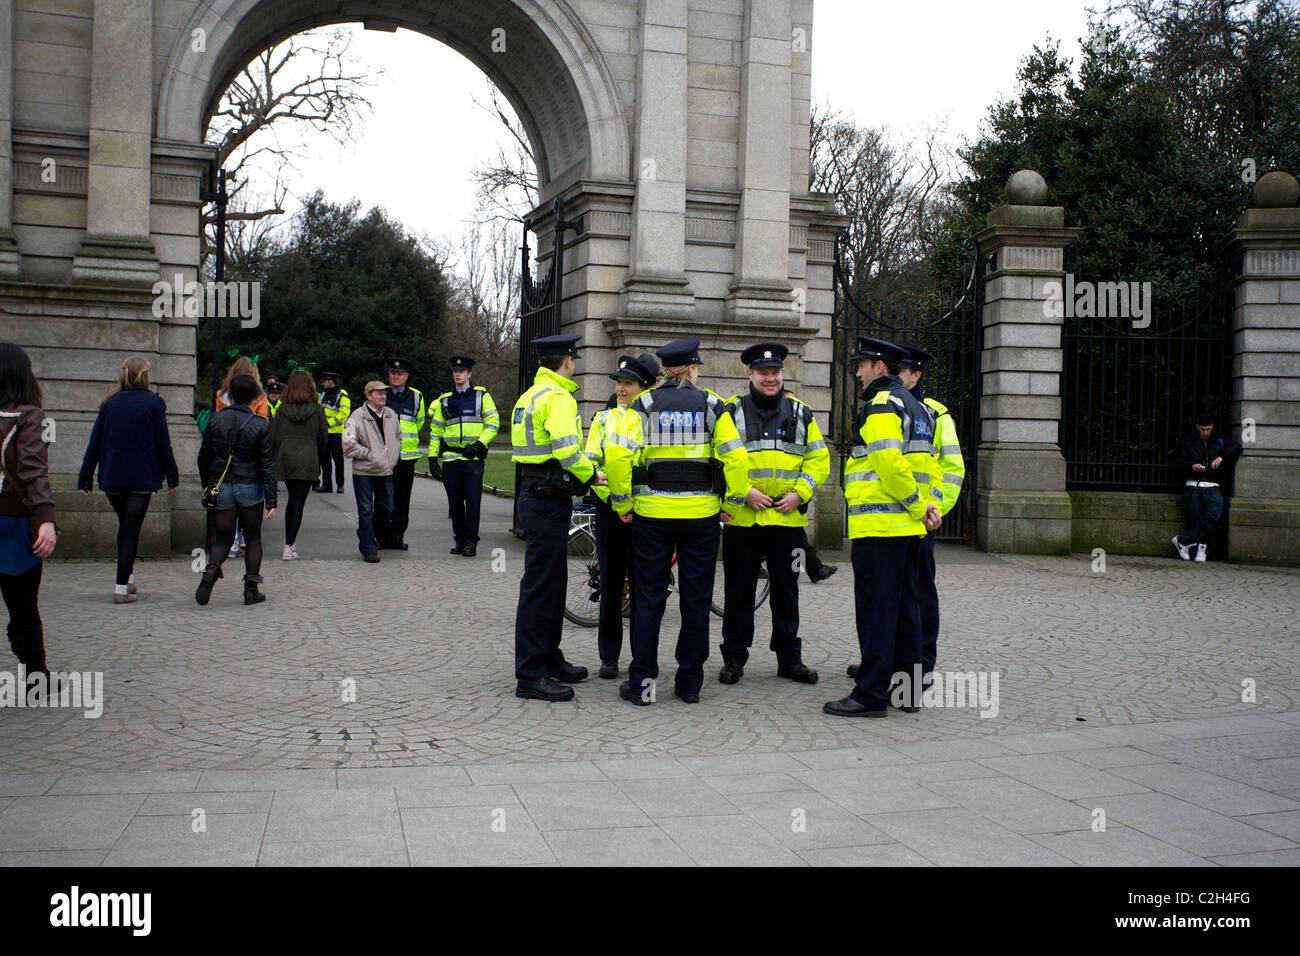 An Garda Siochana outside the entrance gates of St Stephens Green, Dublin, Ireland on St. Patrick's Day. Stock Photo